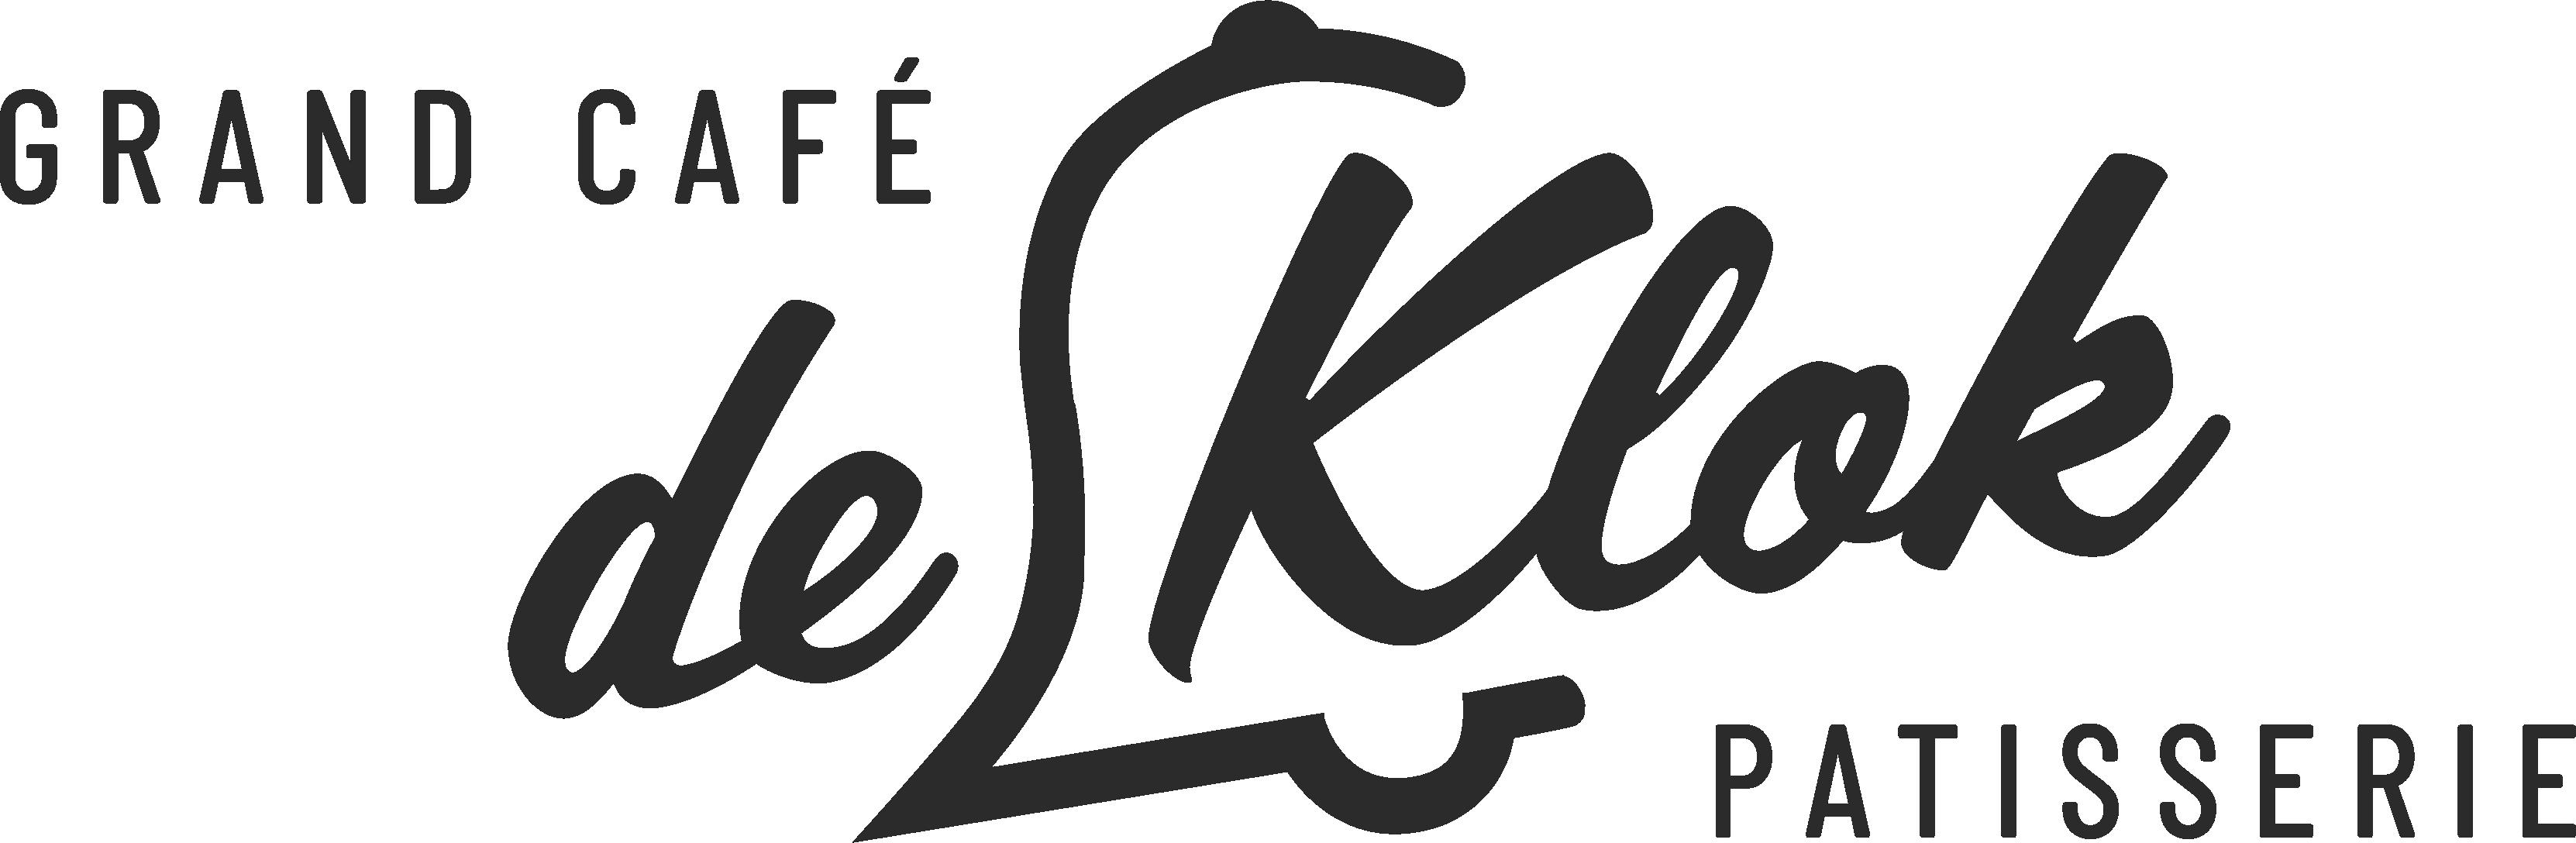 Eet-Feestcafé De Klok